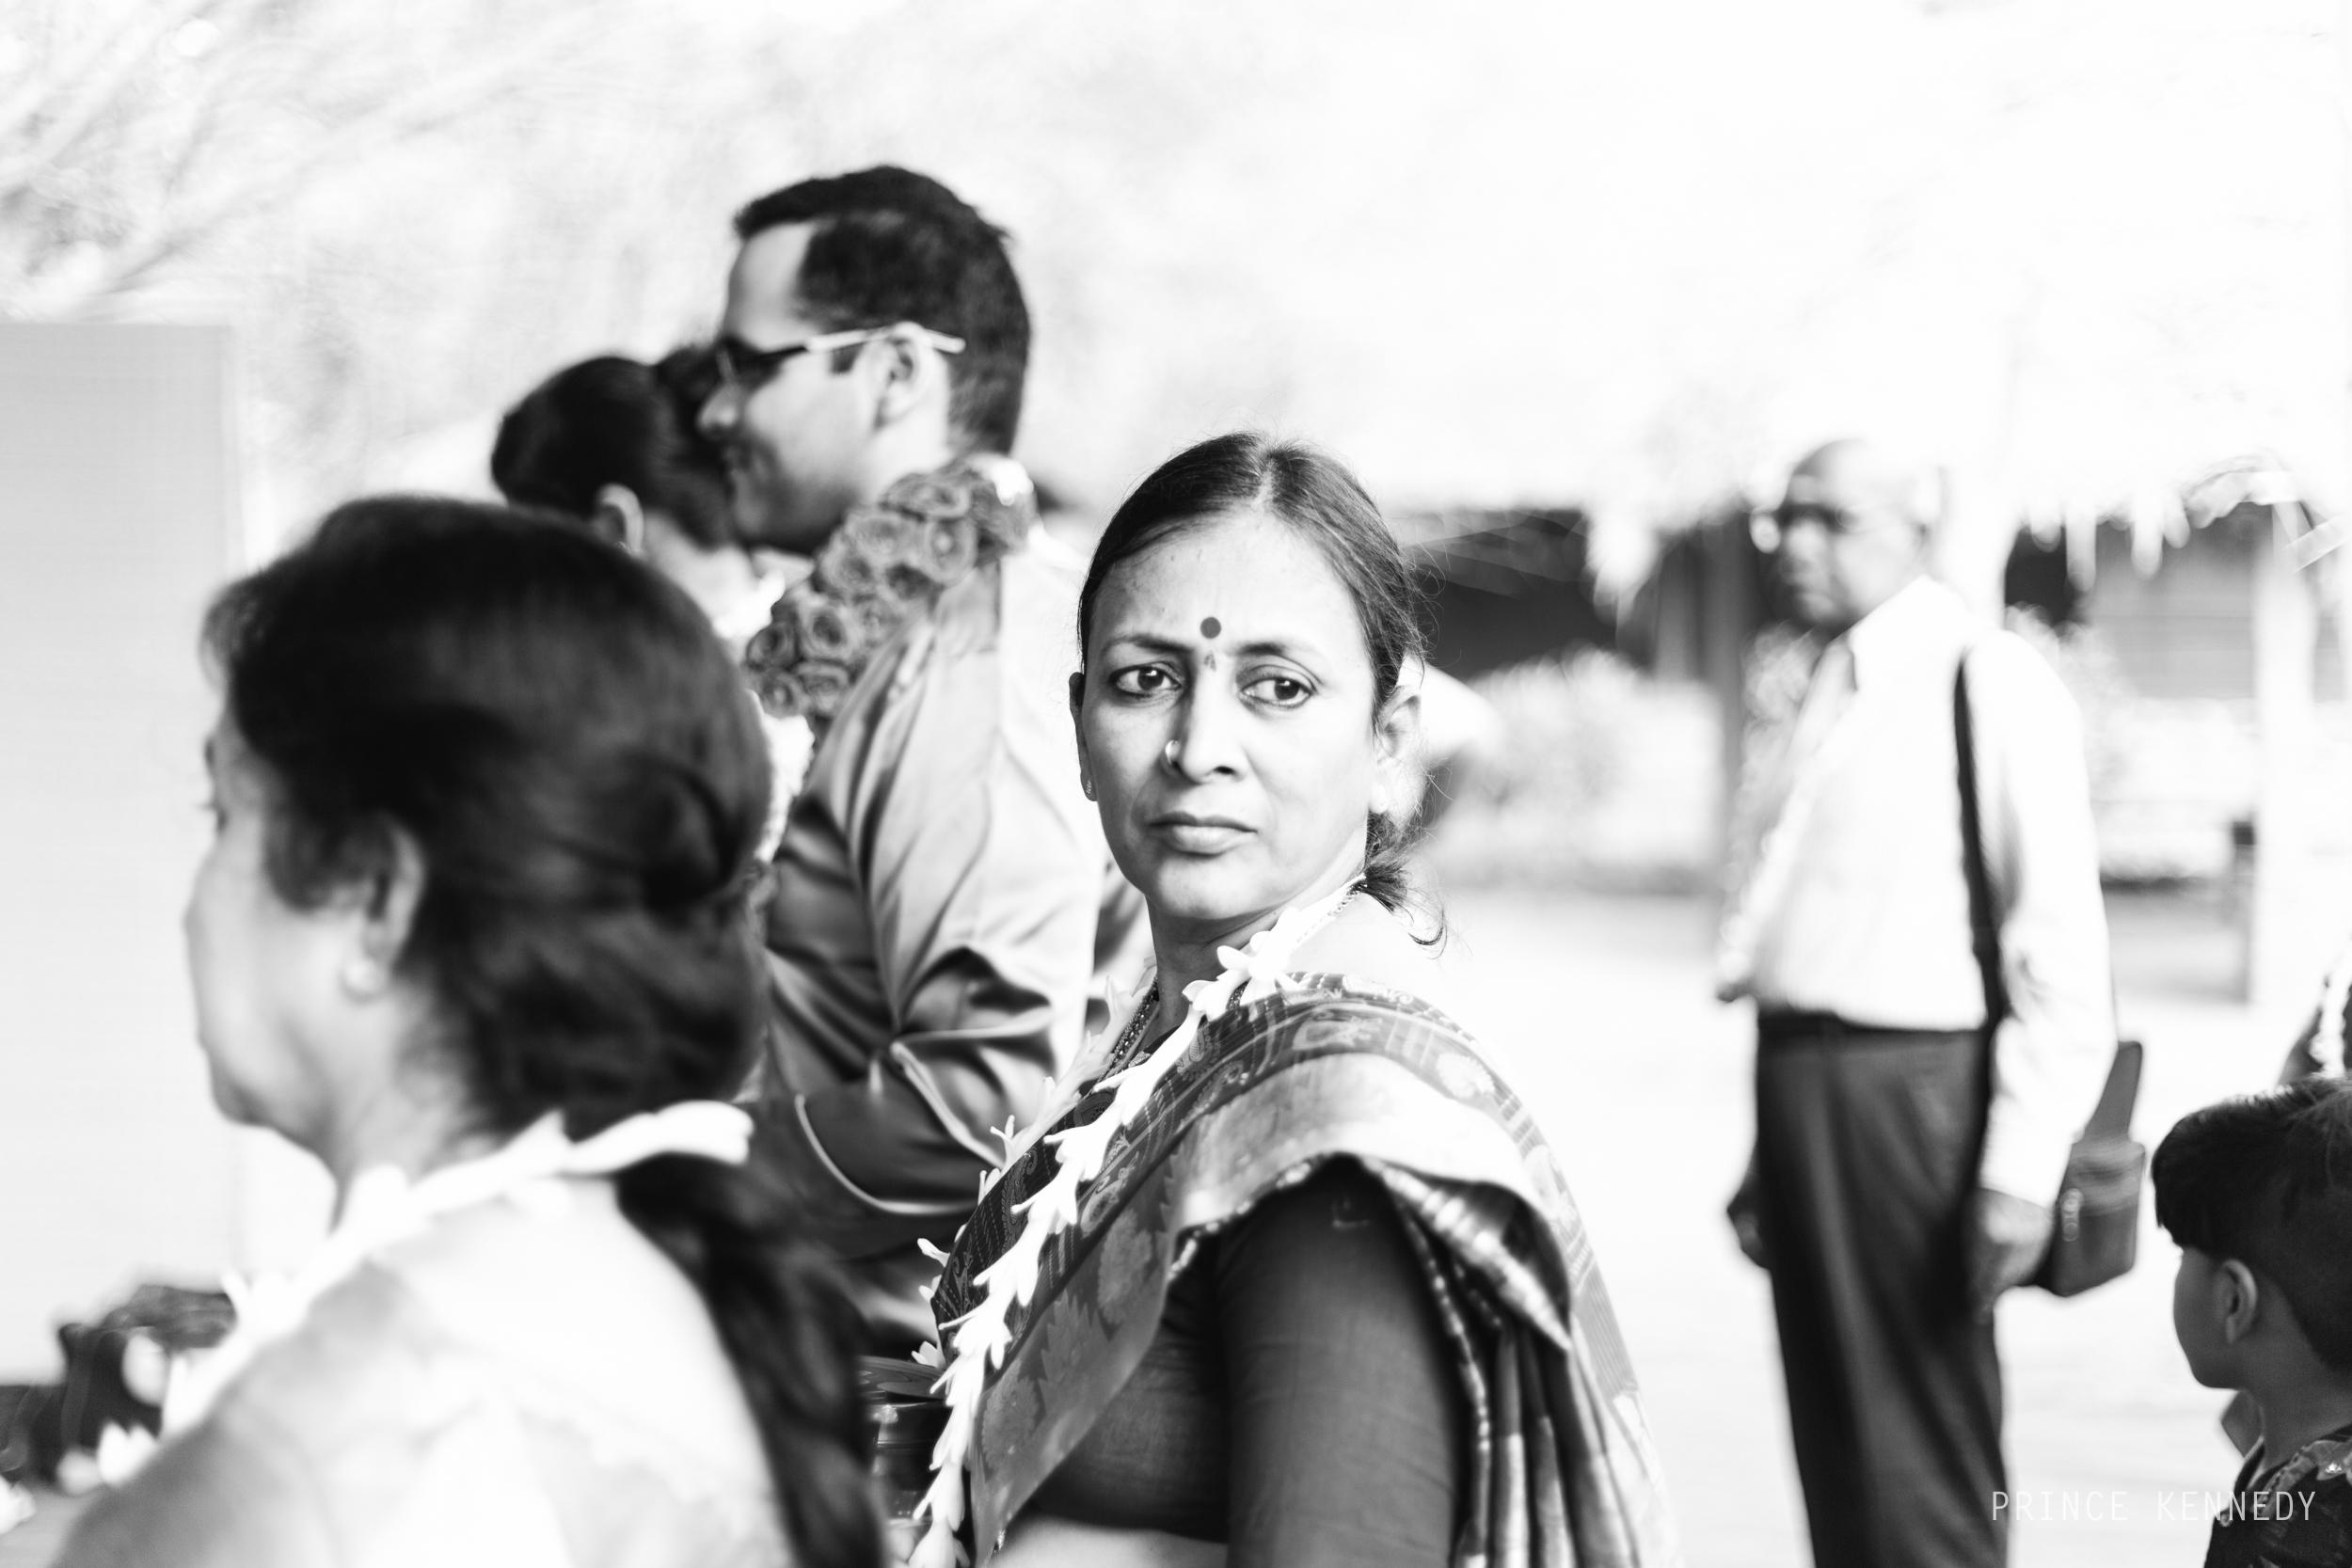 Athmajja-Nithesh-Engagement-Couple-Portrait-Portraiture-Wedding-Couple-Portrait-Chennai-Photographer-Candid-Photography-Destination-Best-Prince-Kennedy-Photography-112.jpg